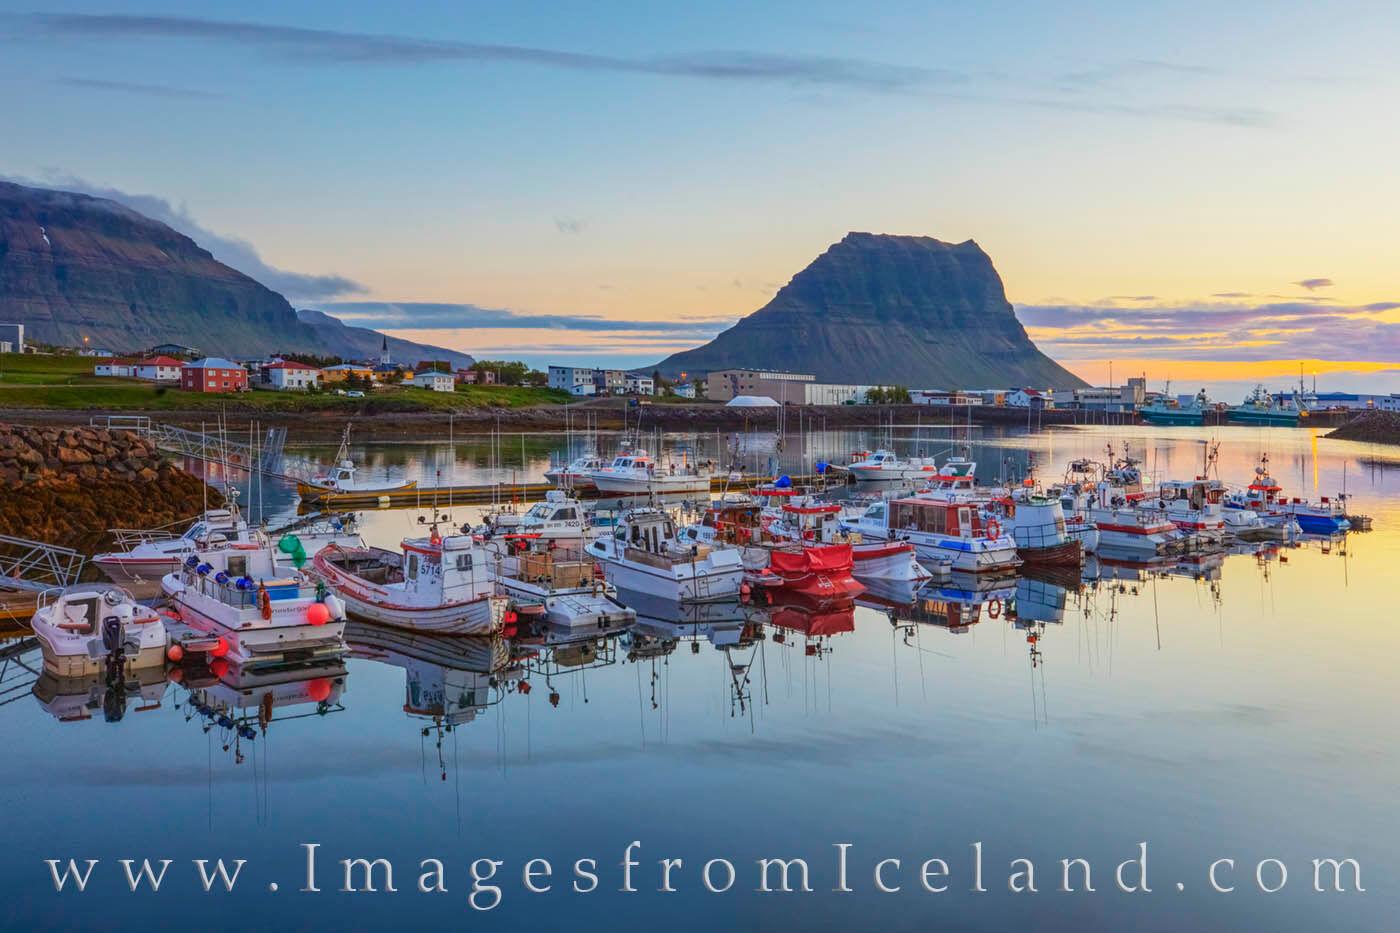 The well-known Kirkjufell Mountain looms over the peaceful Grundarfjörður Harbor in the never-ending daylight of a summer...